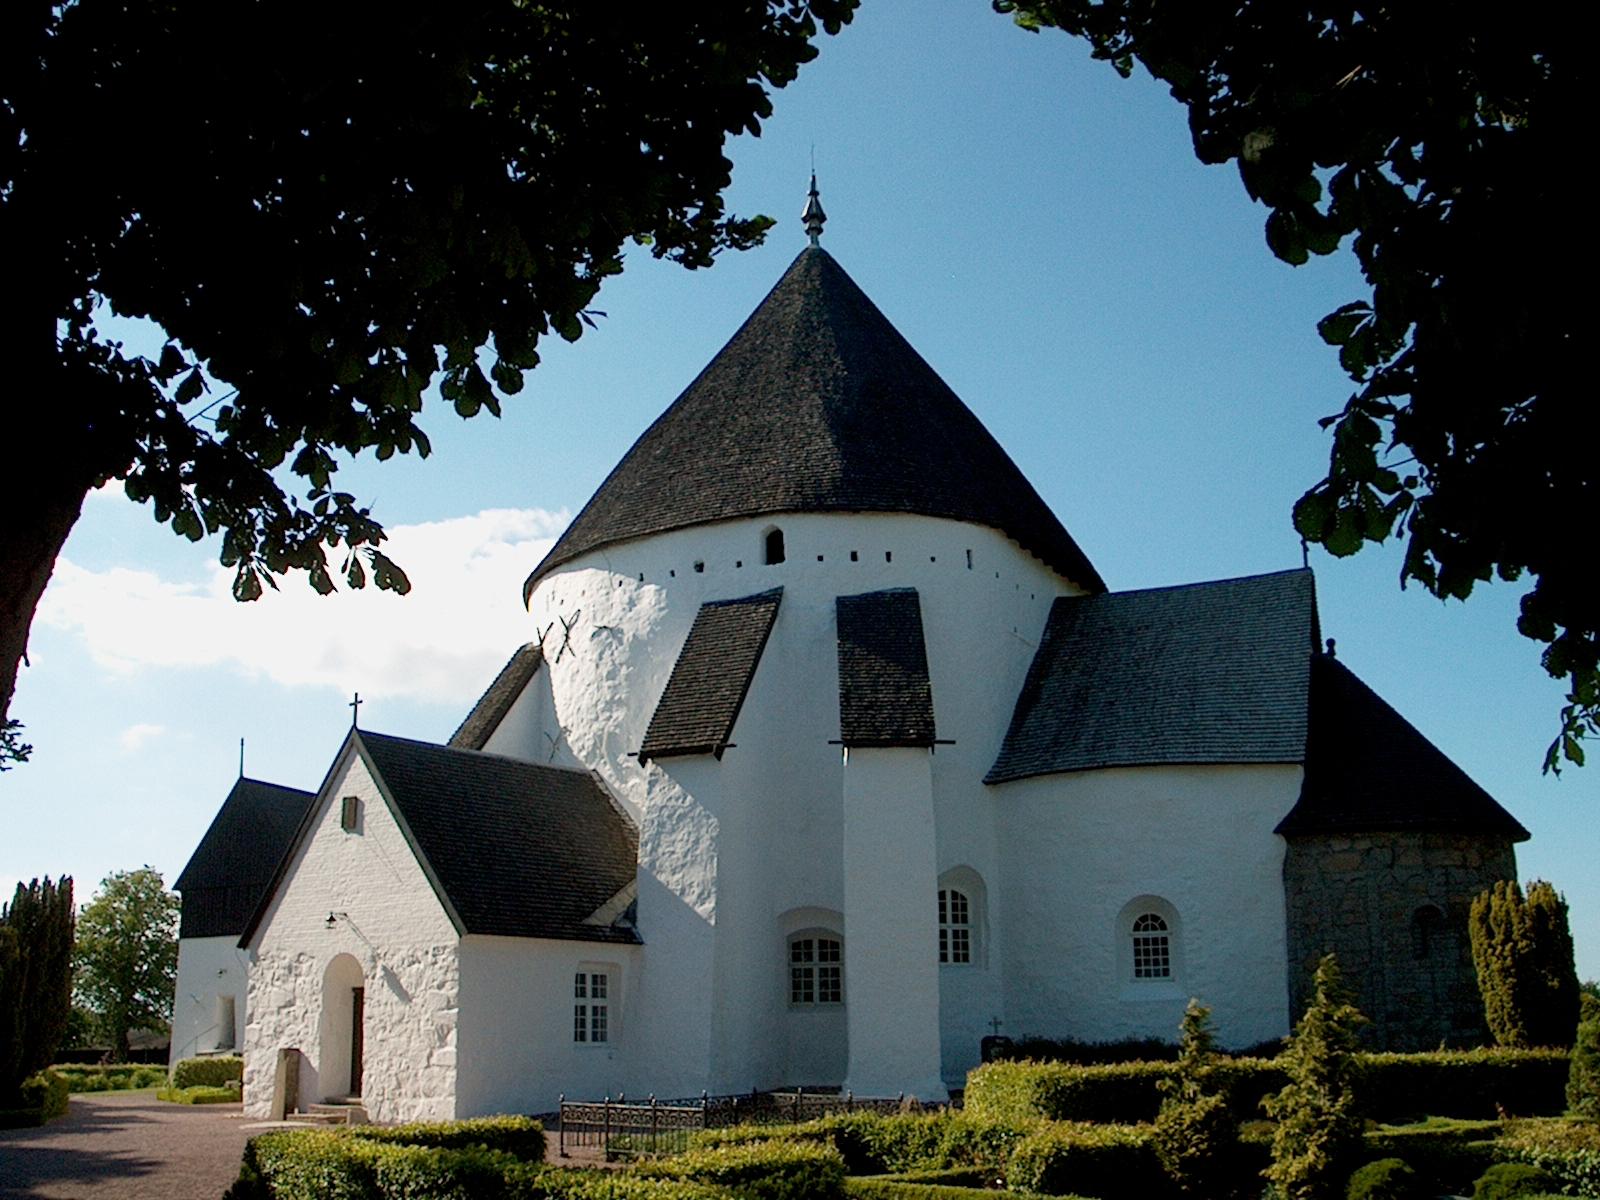 Østerlars Church